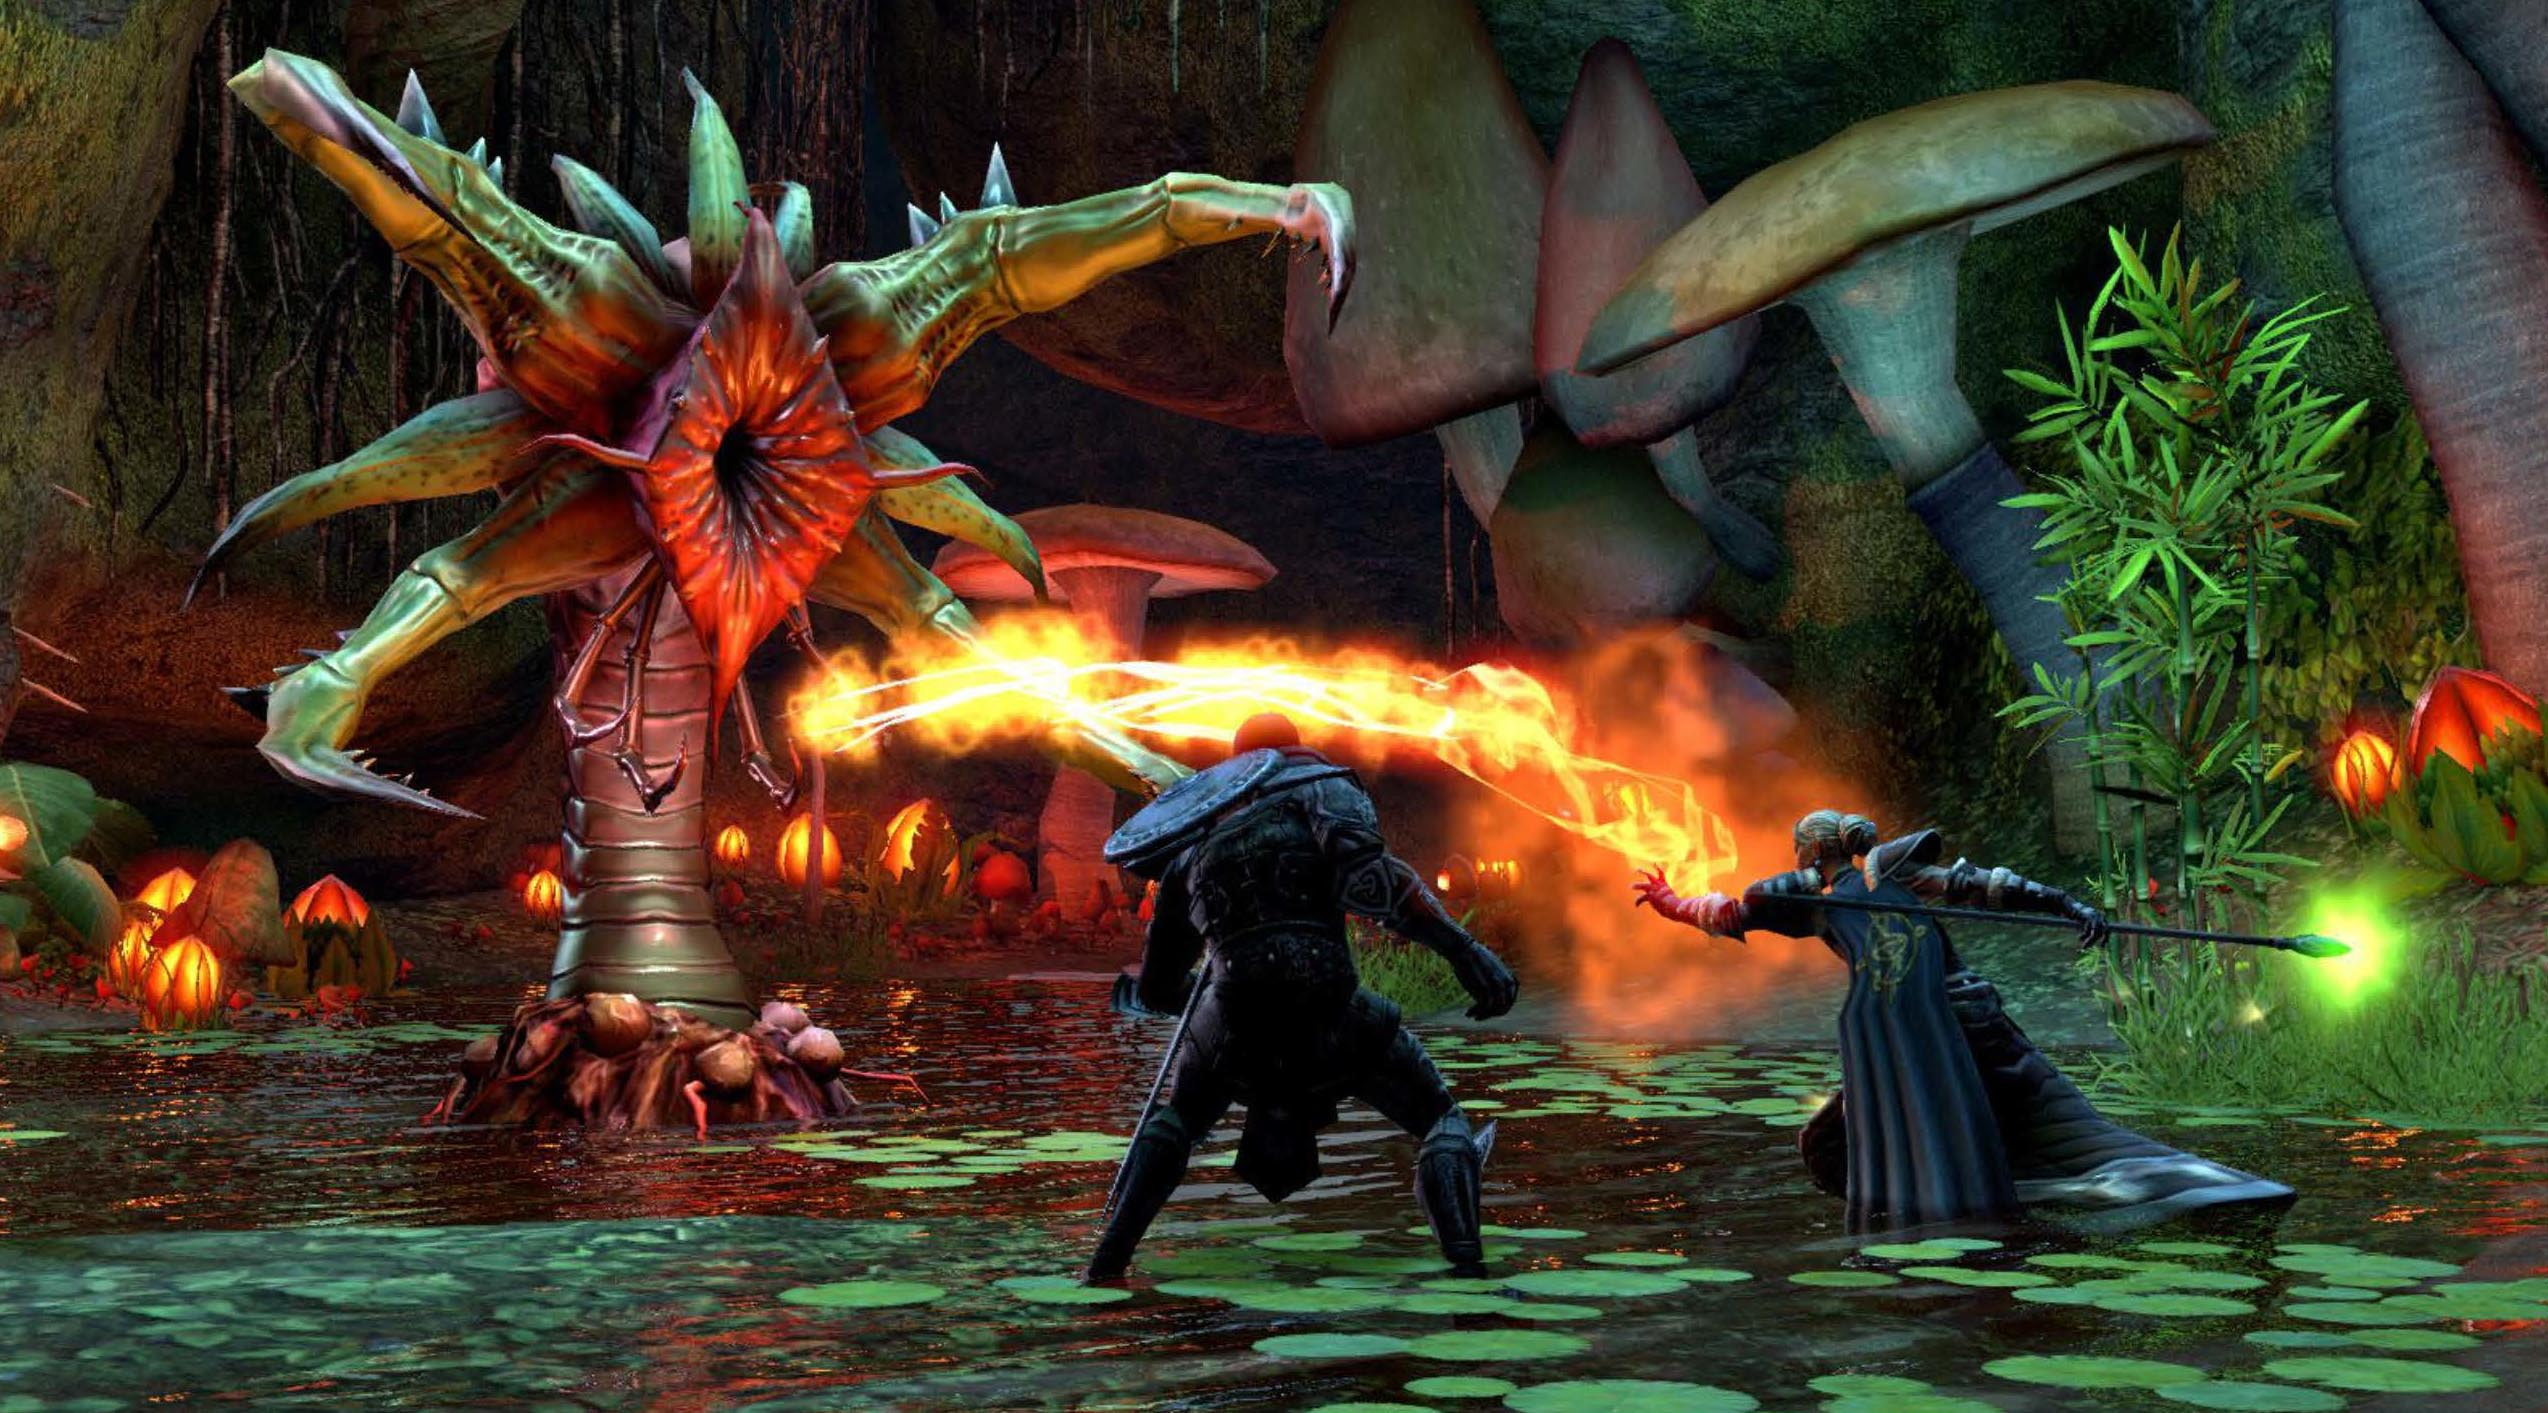 Скриншоты и арты The Elder Scrolls Online.